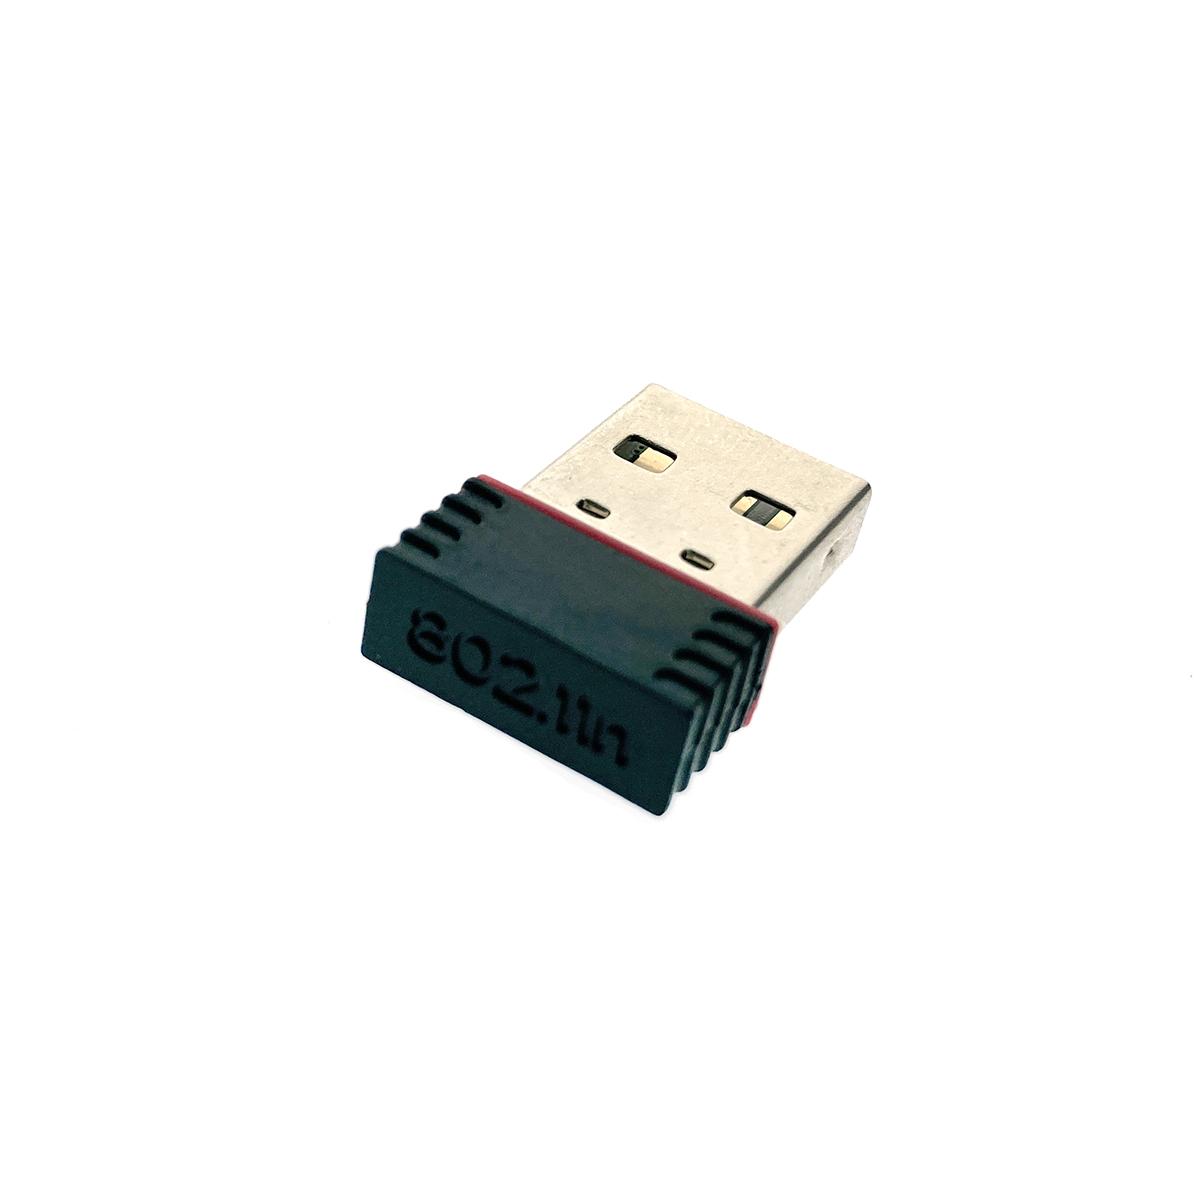 USB - Wifi адаптер 150Мбит/c, 802.11n, 2,4 ГГц, Espada UW150-1